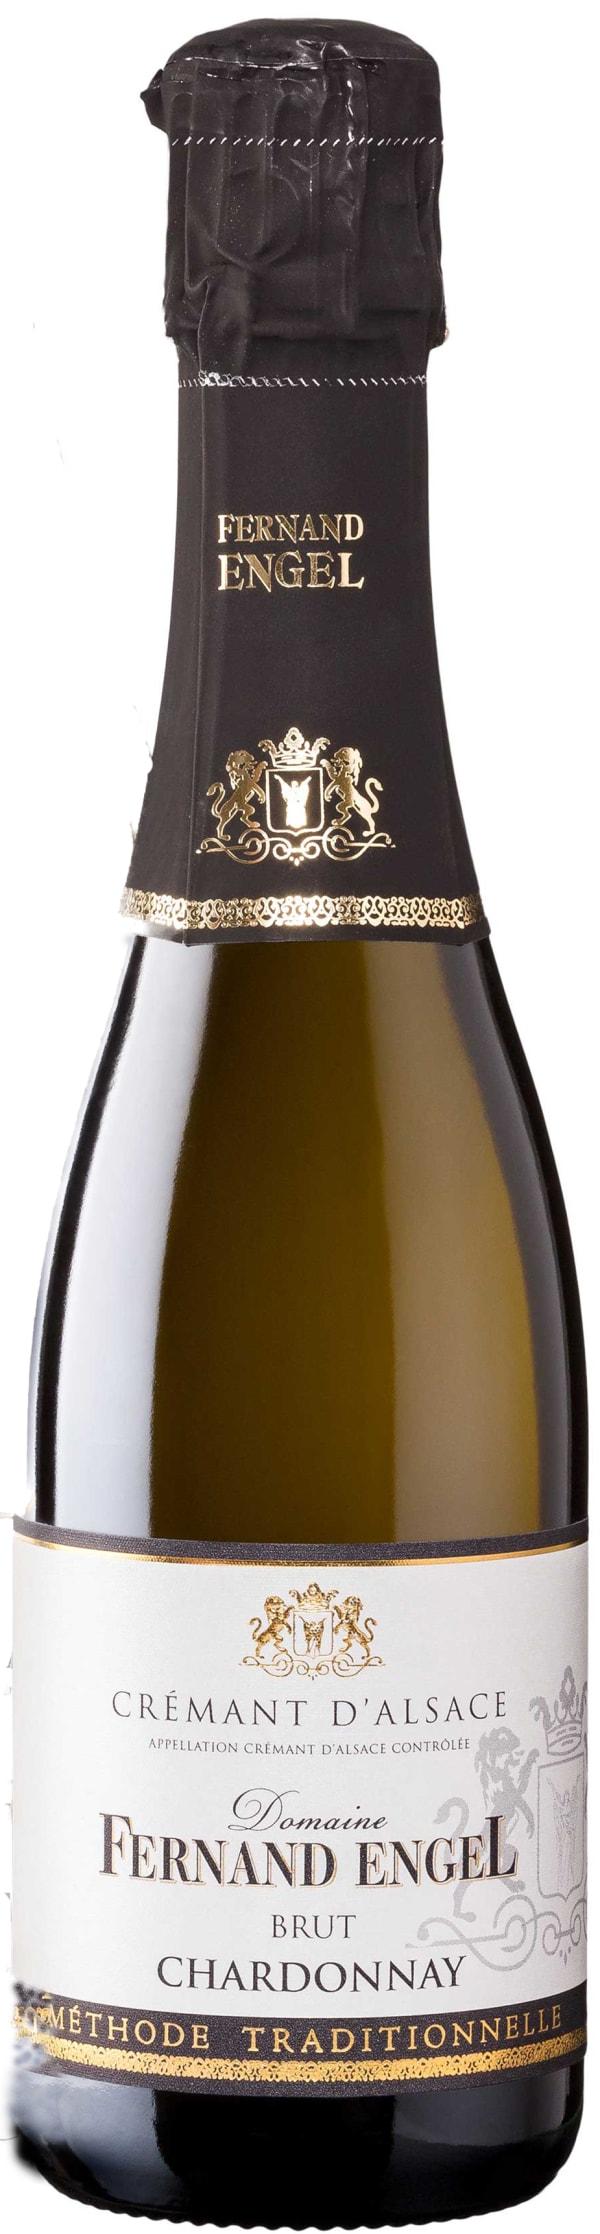 Fernand Engel Crémant d'Alsace Chardonnay Brut